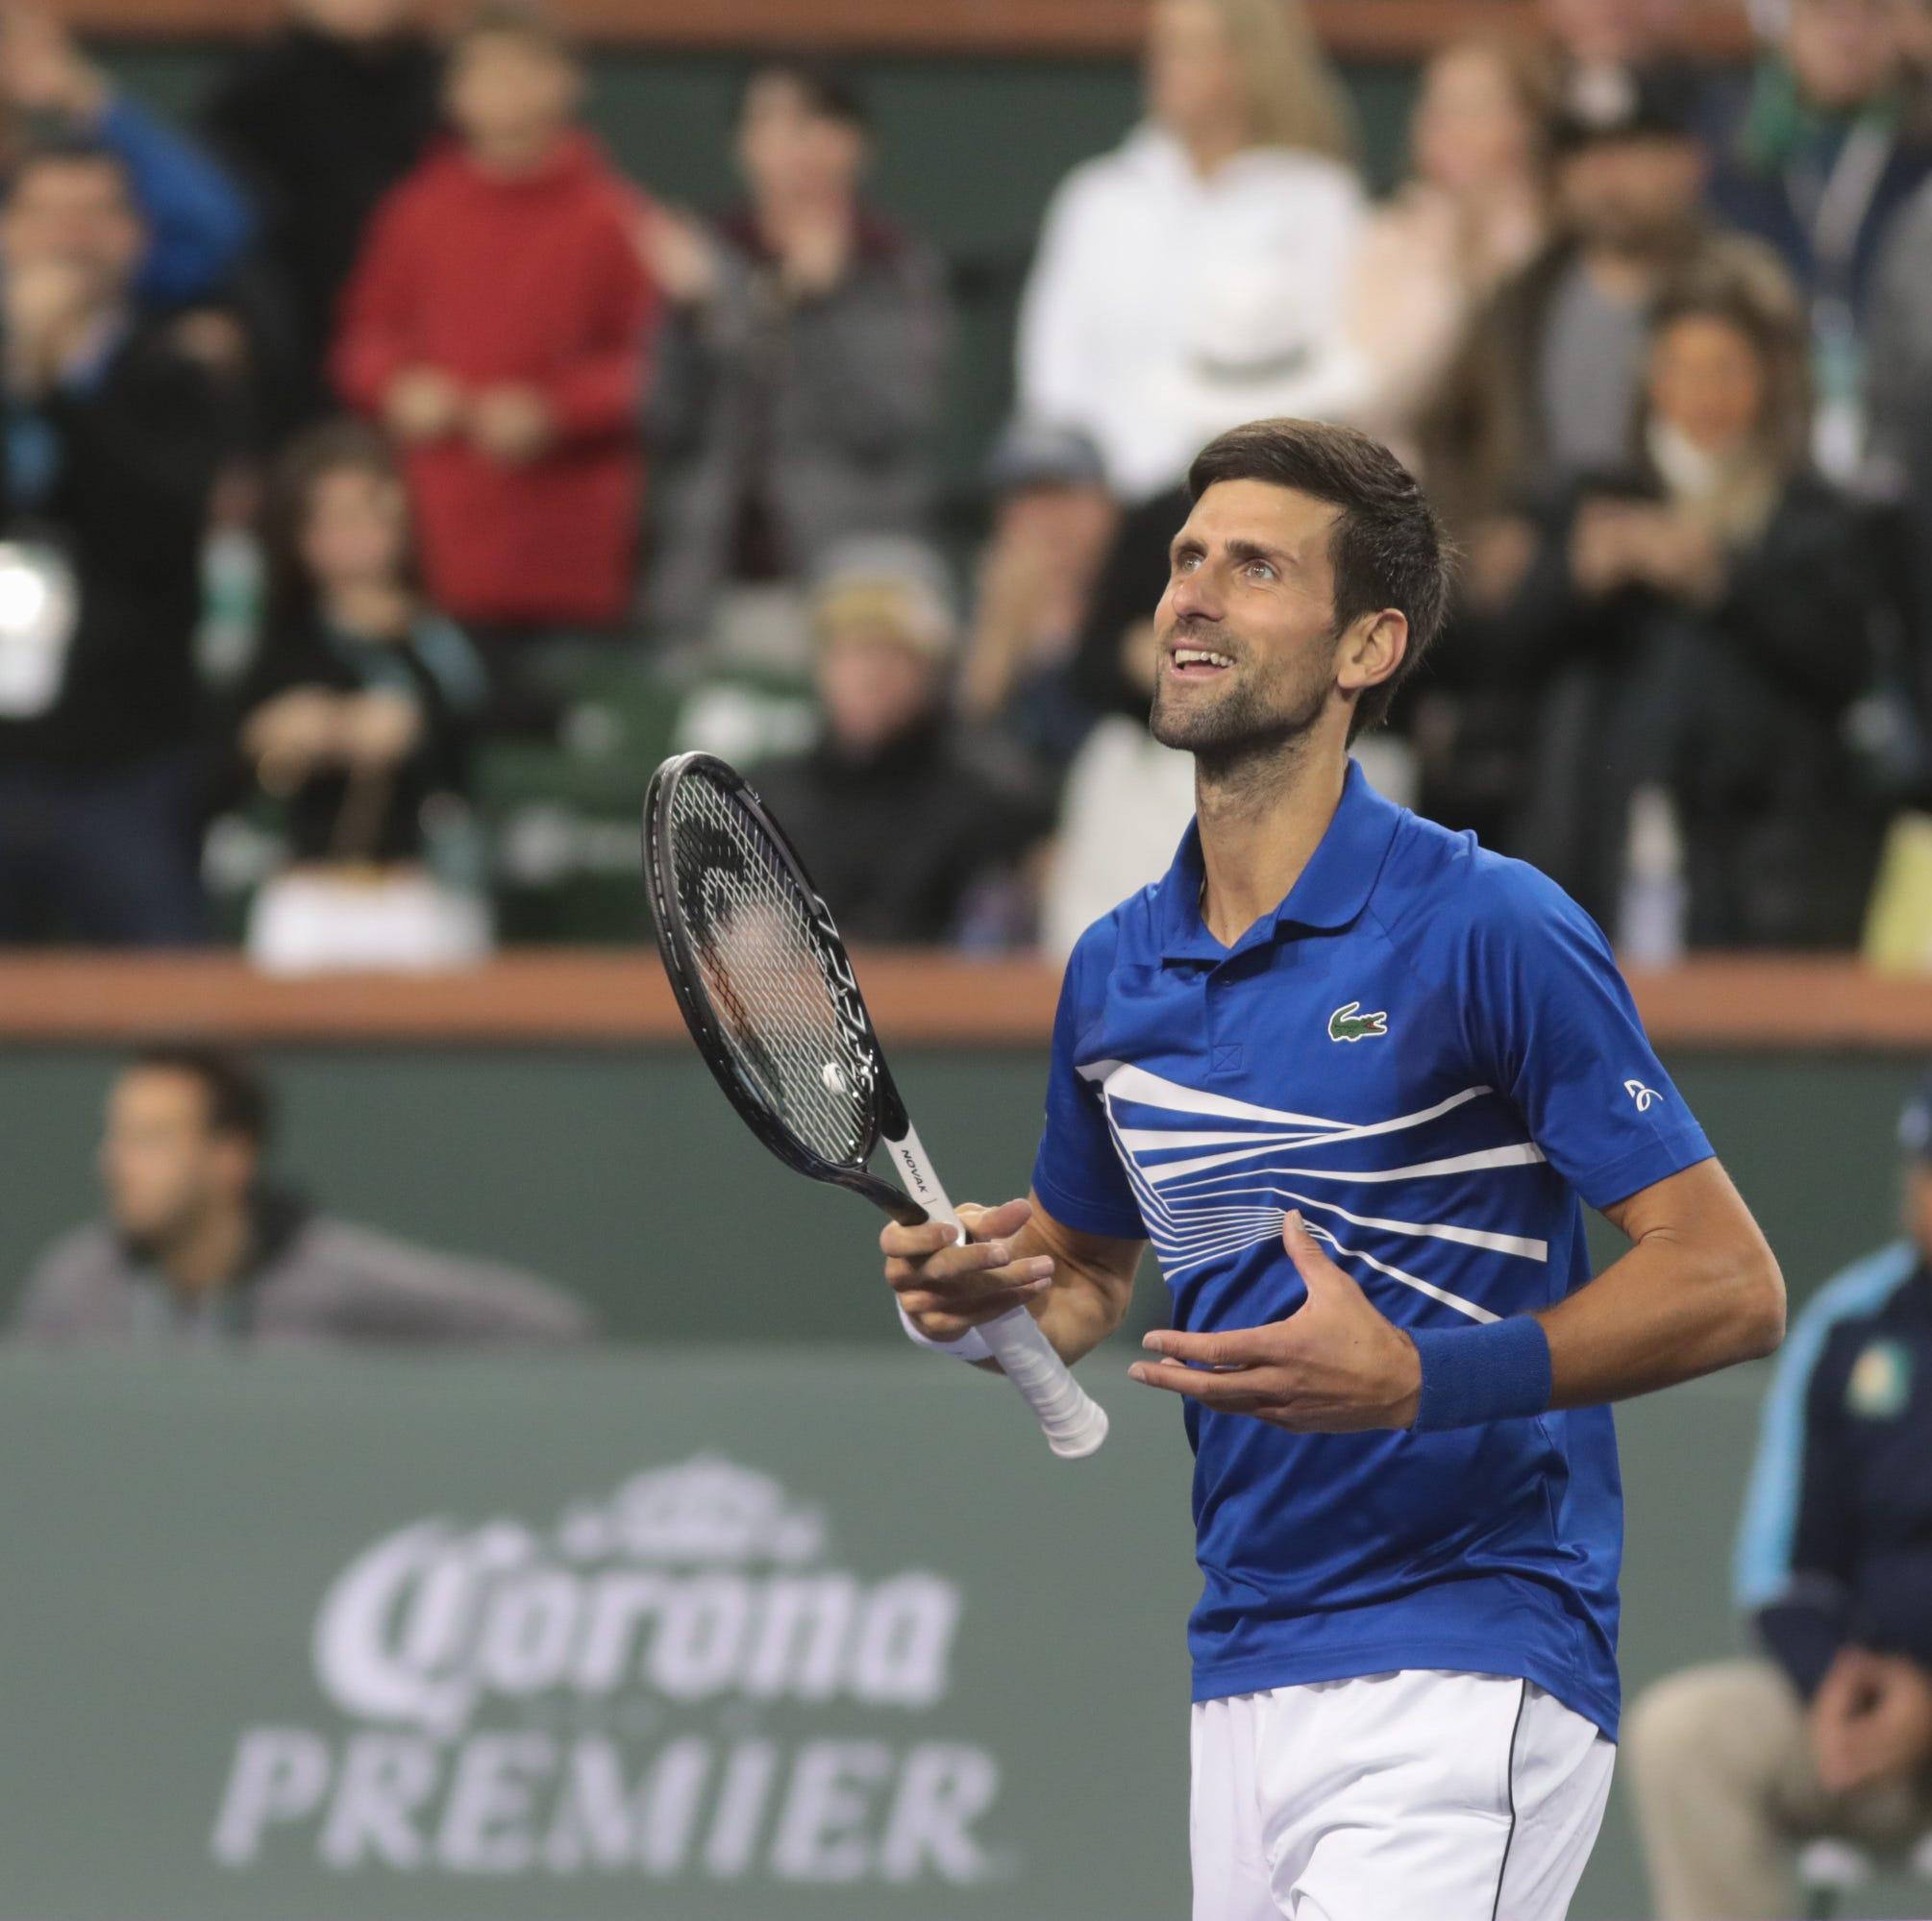 Novak Djokovic fights through opponent, case of deja vu to advance